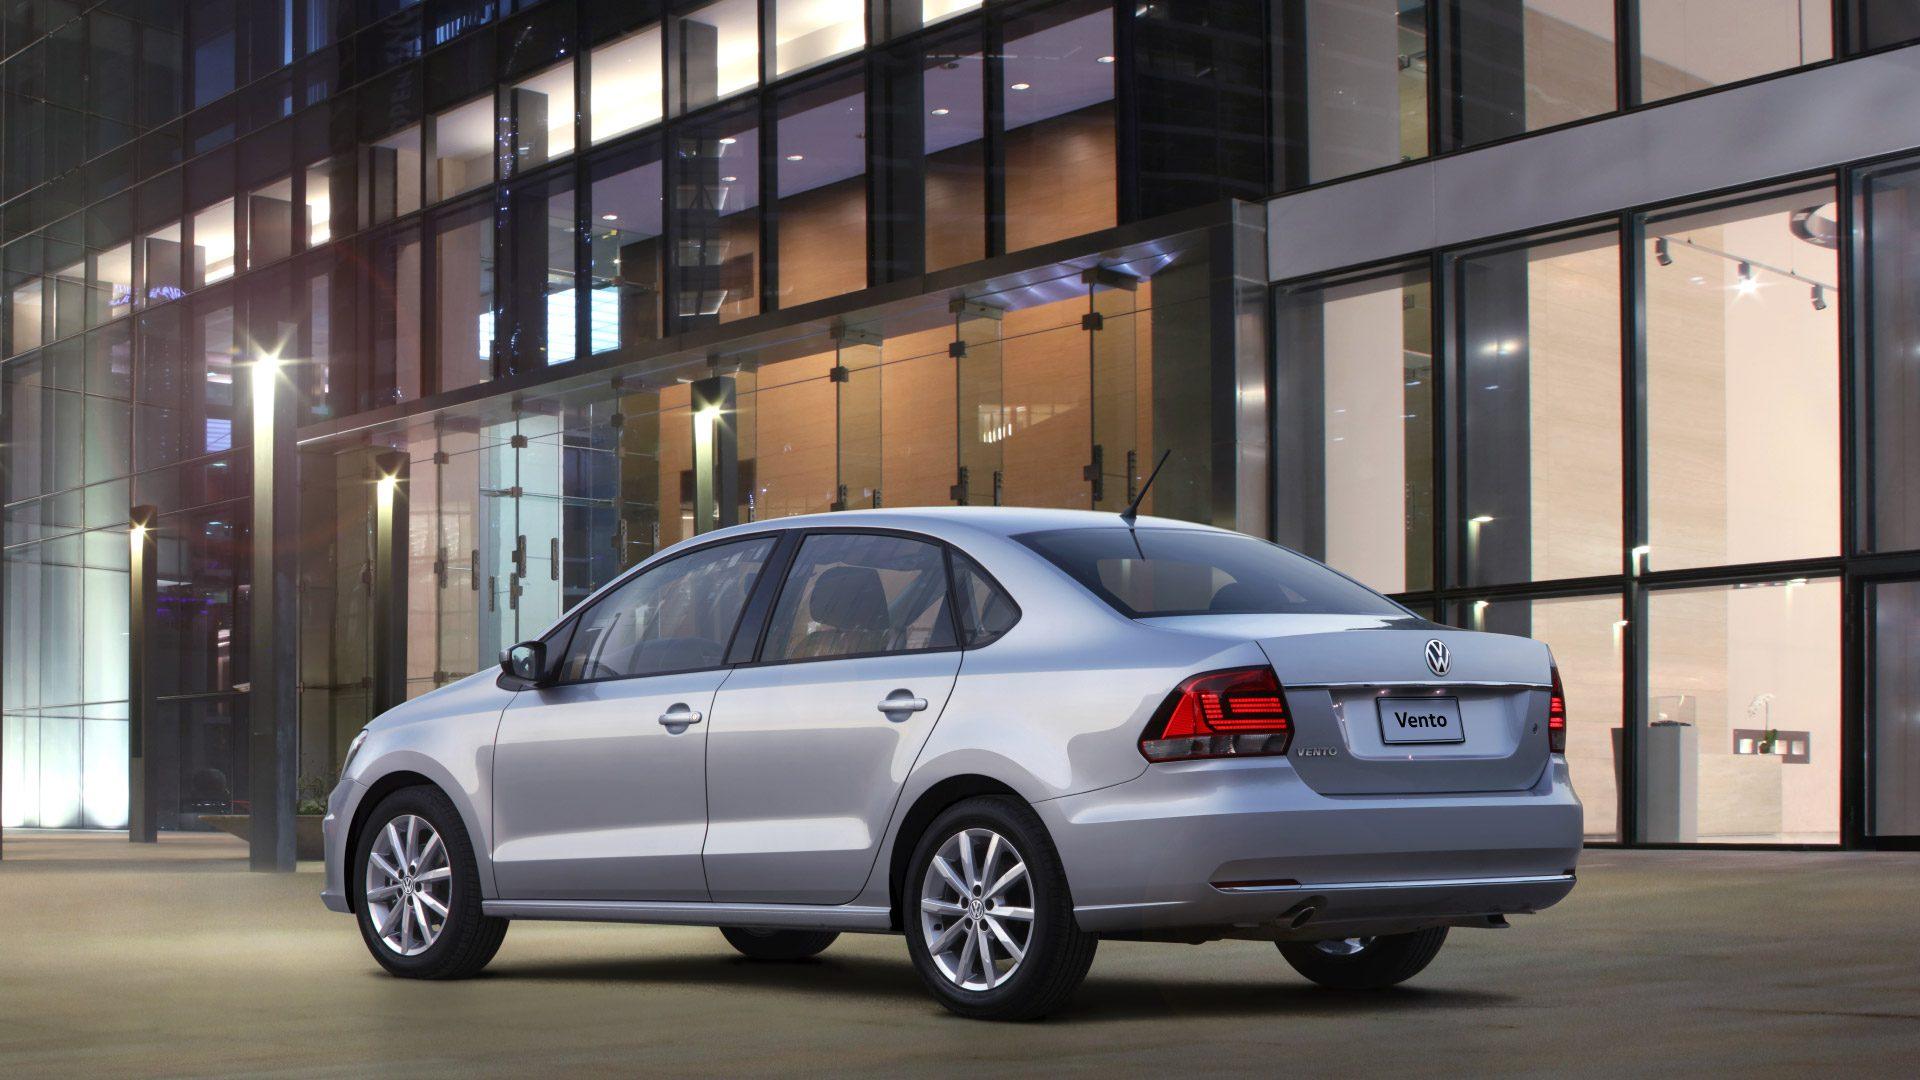 VW Vento 2019 posterior